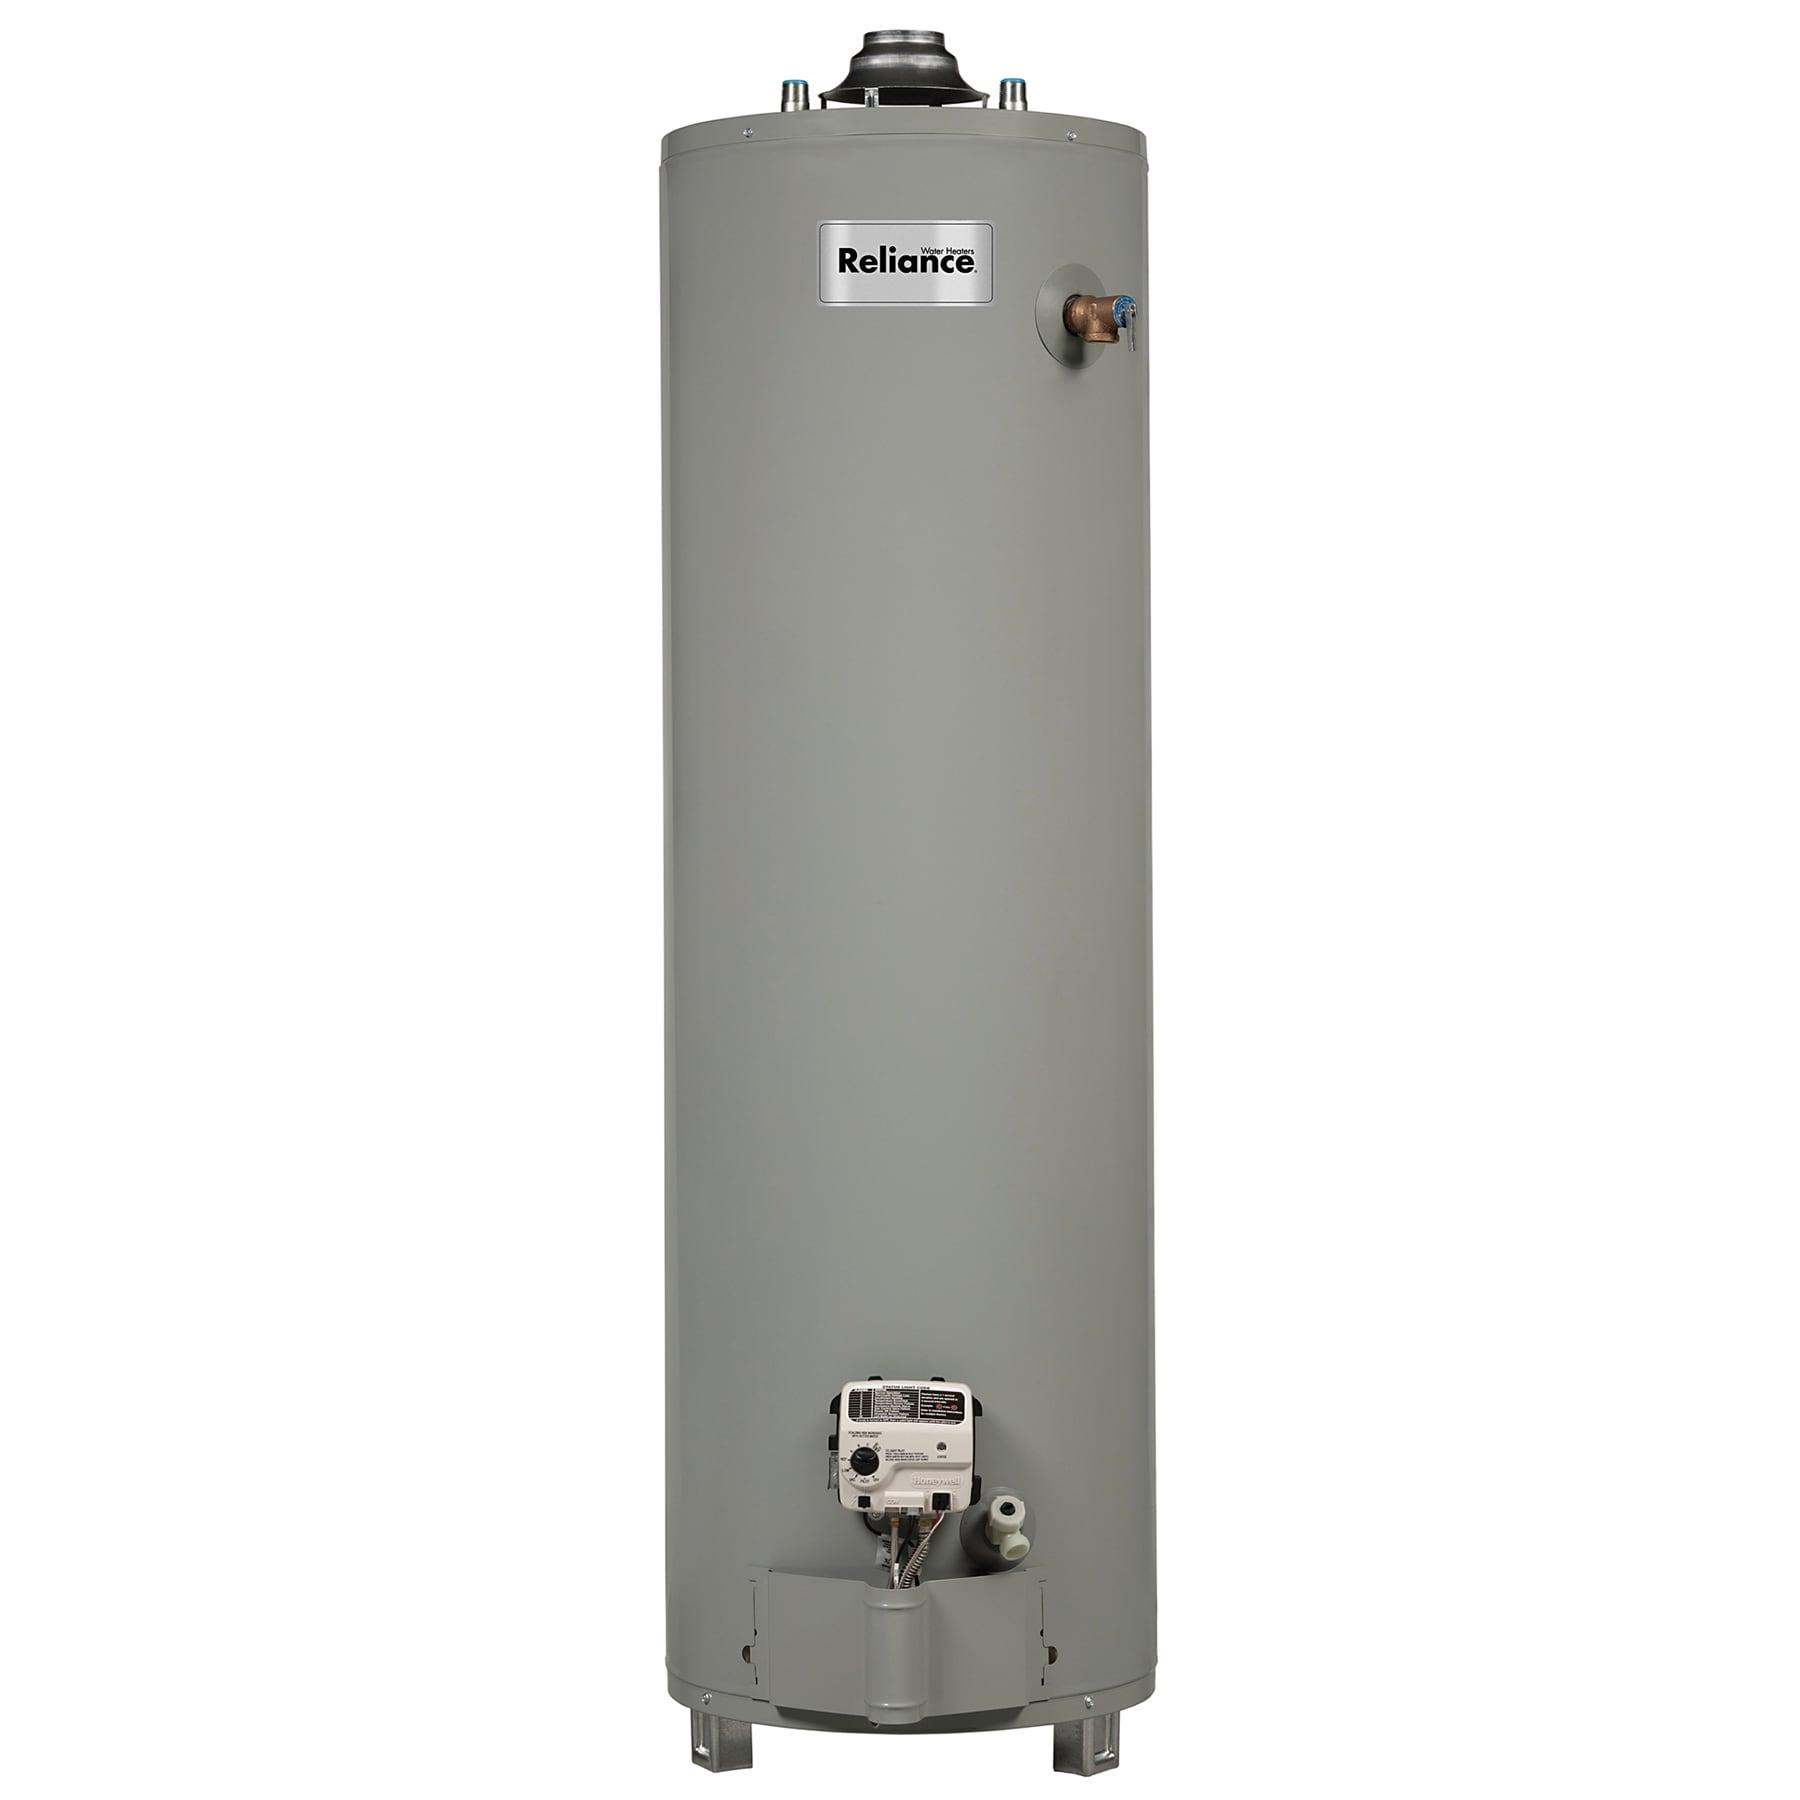 Jensen Reliance 9 40 Unkct 40 Gallon Gas Water Heater (Wa...